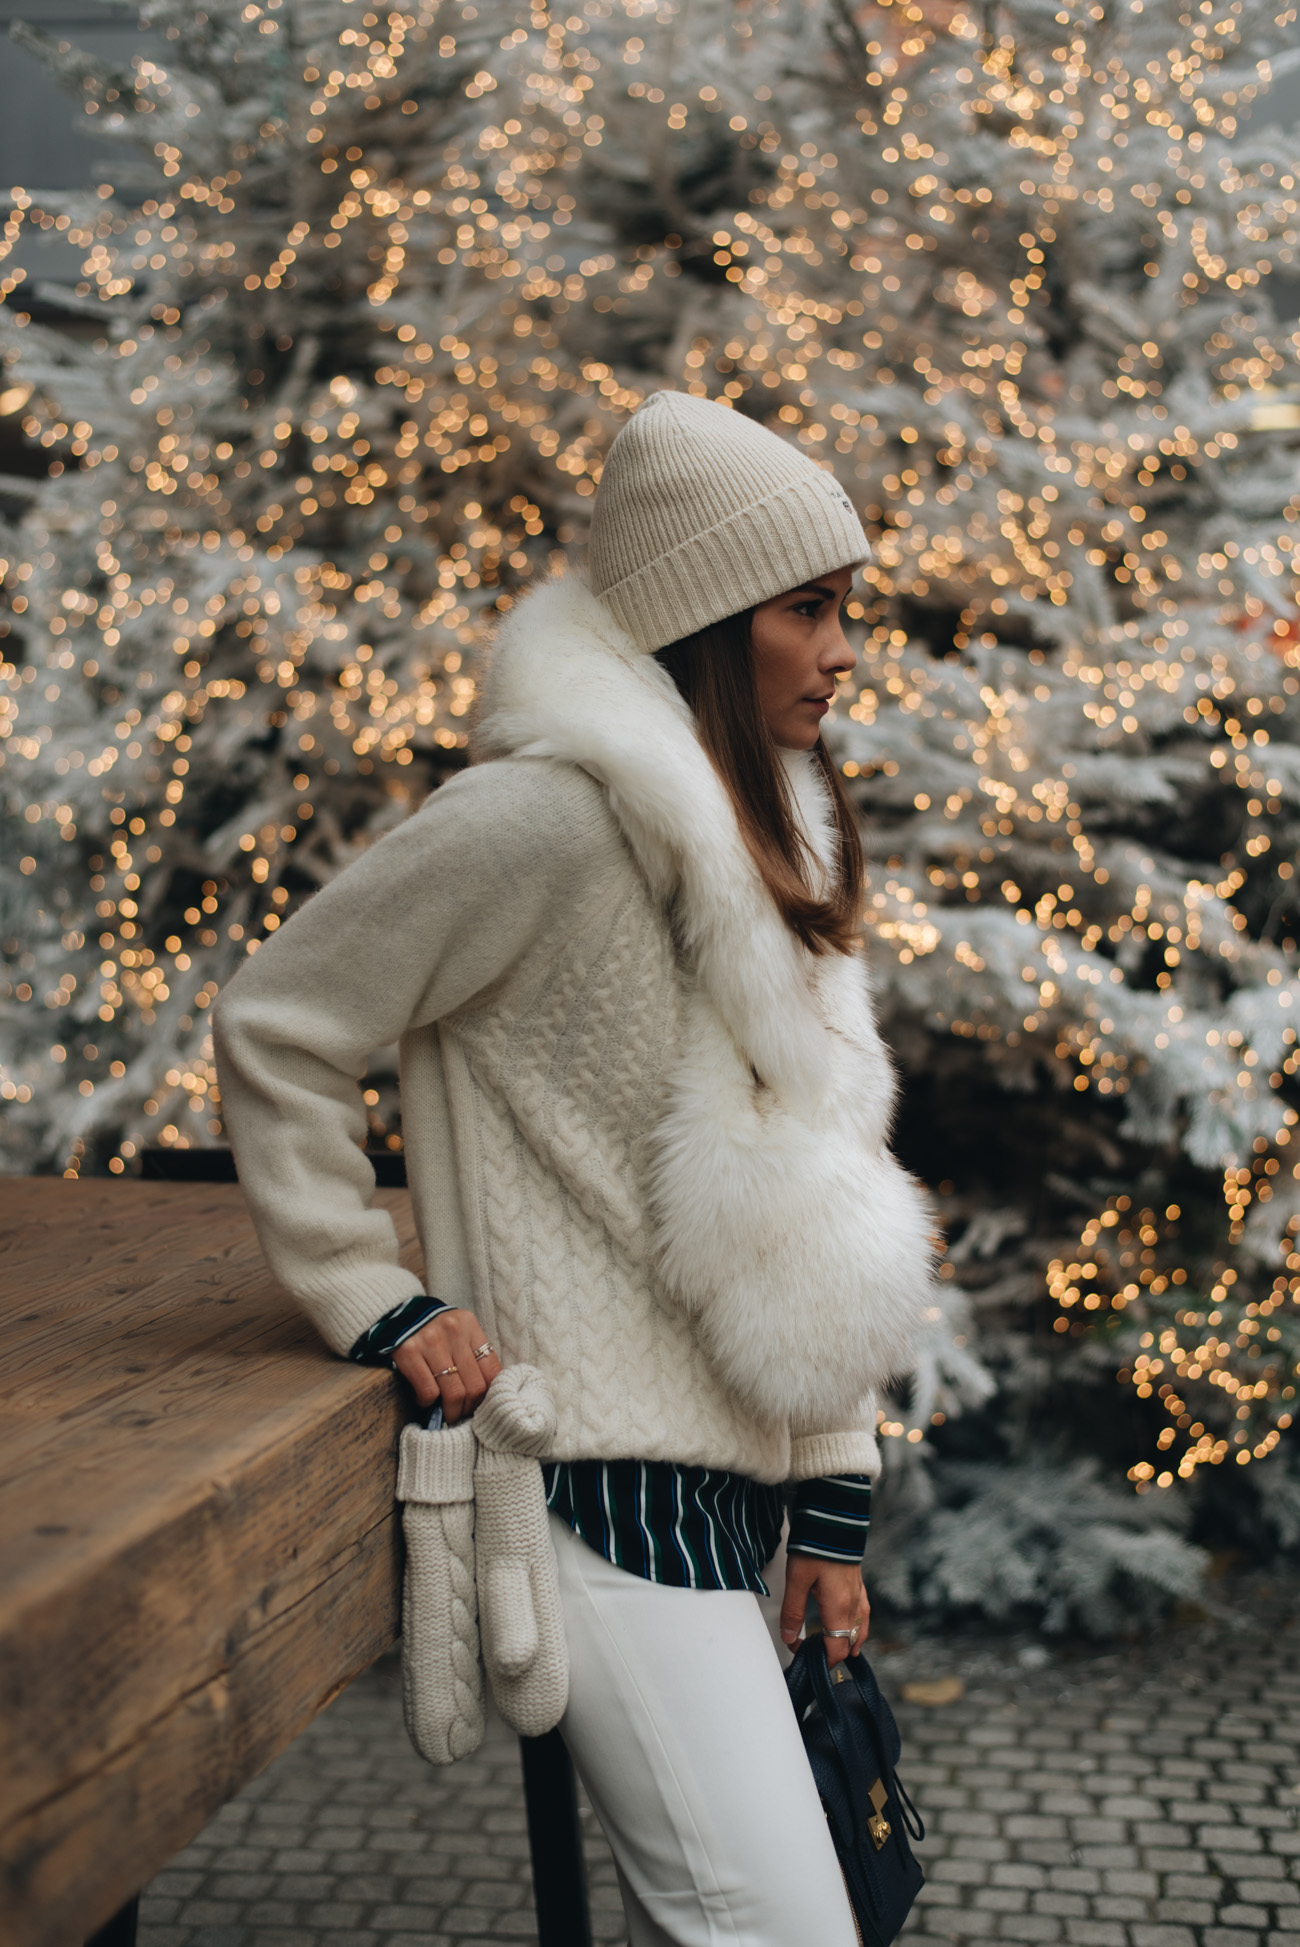 mode-bloggerin-nina-schwichtenberg-streetstyle-mode-trends-herbst-winter-2017-schmuck-fashiioncarpet